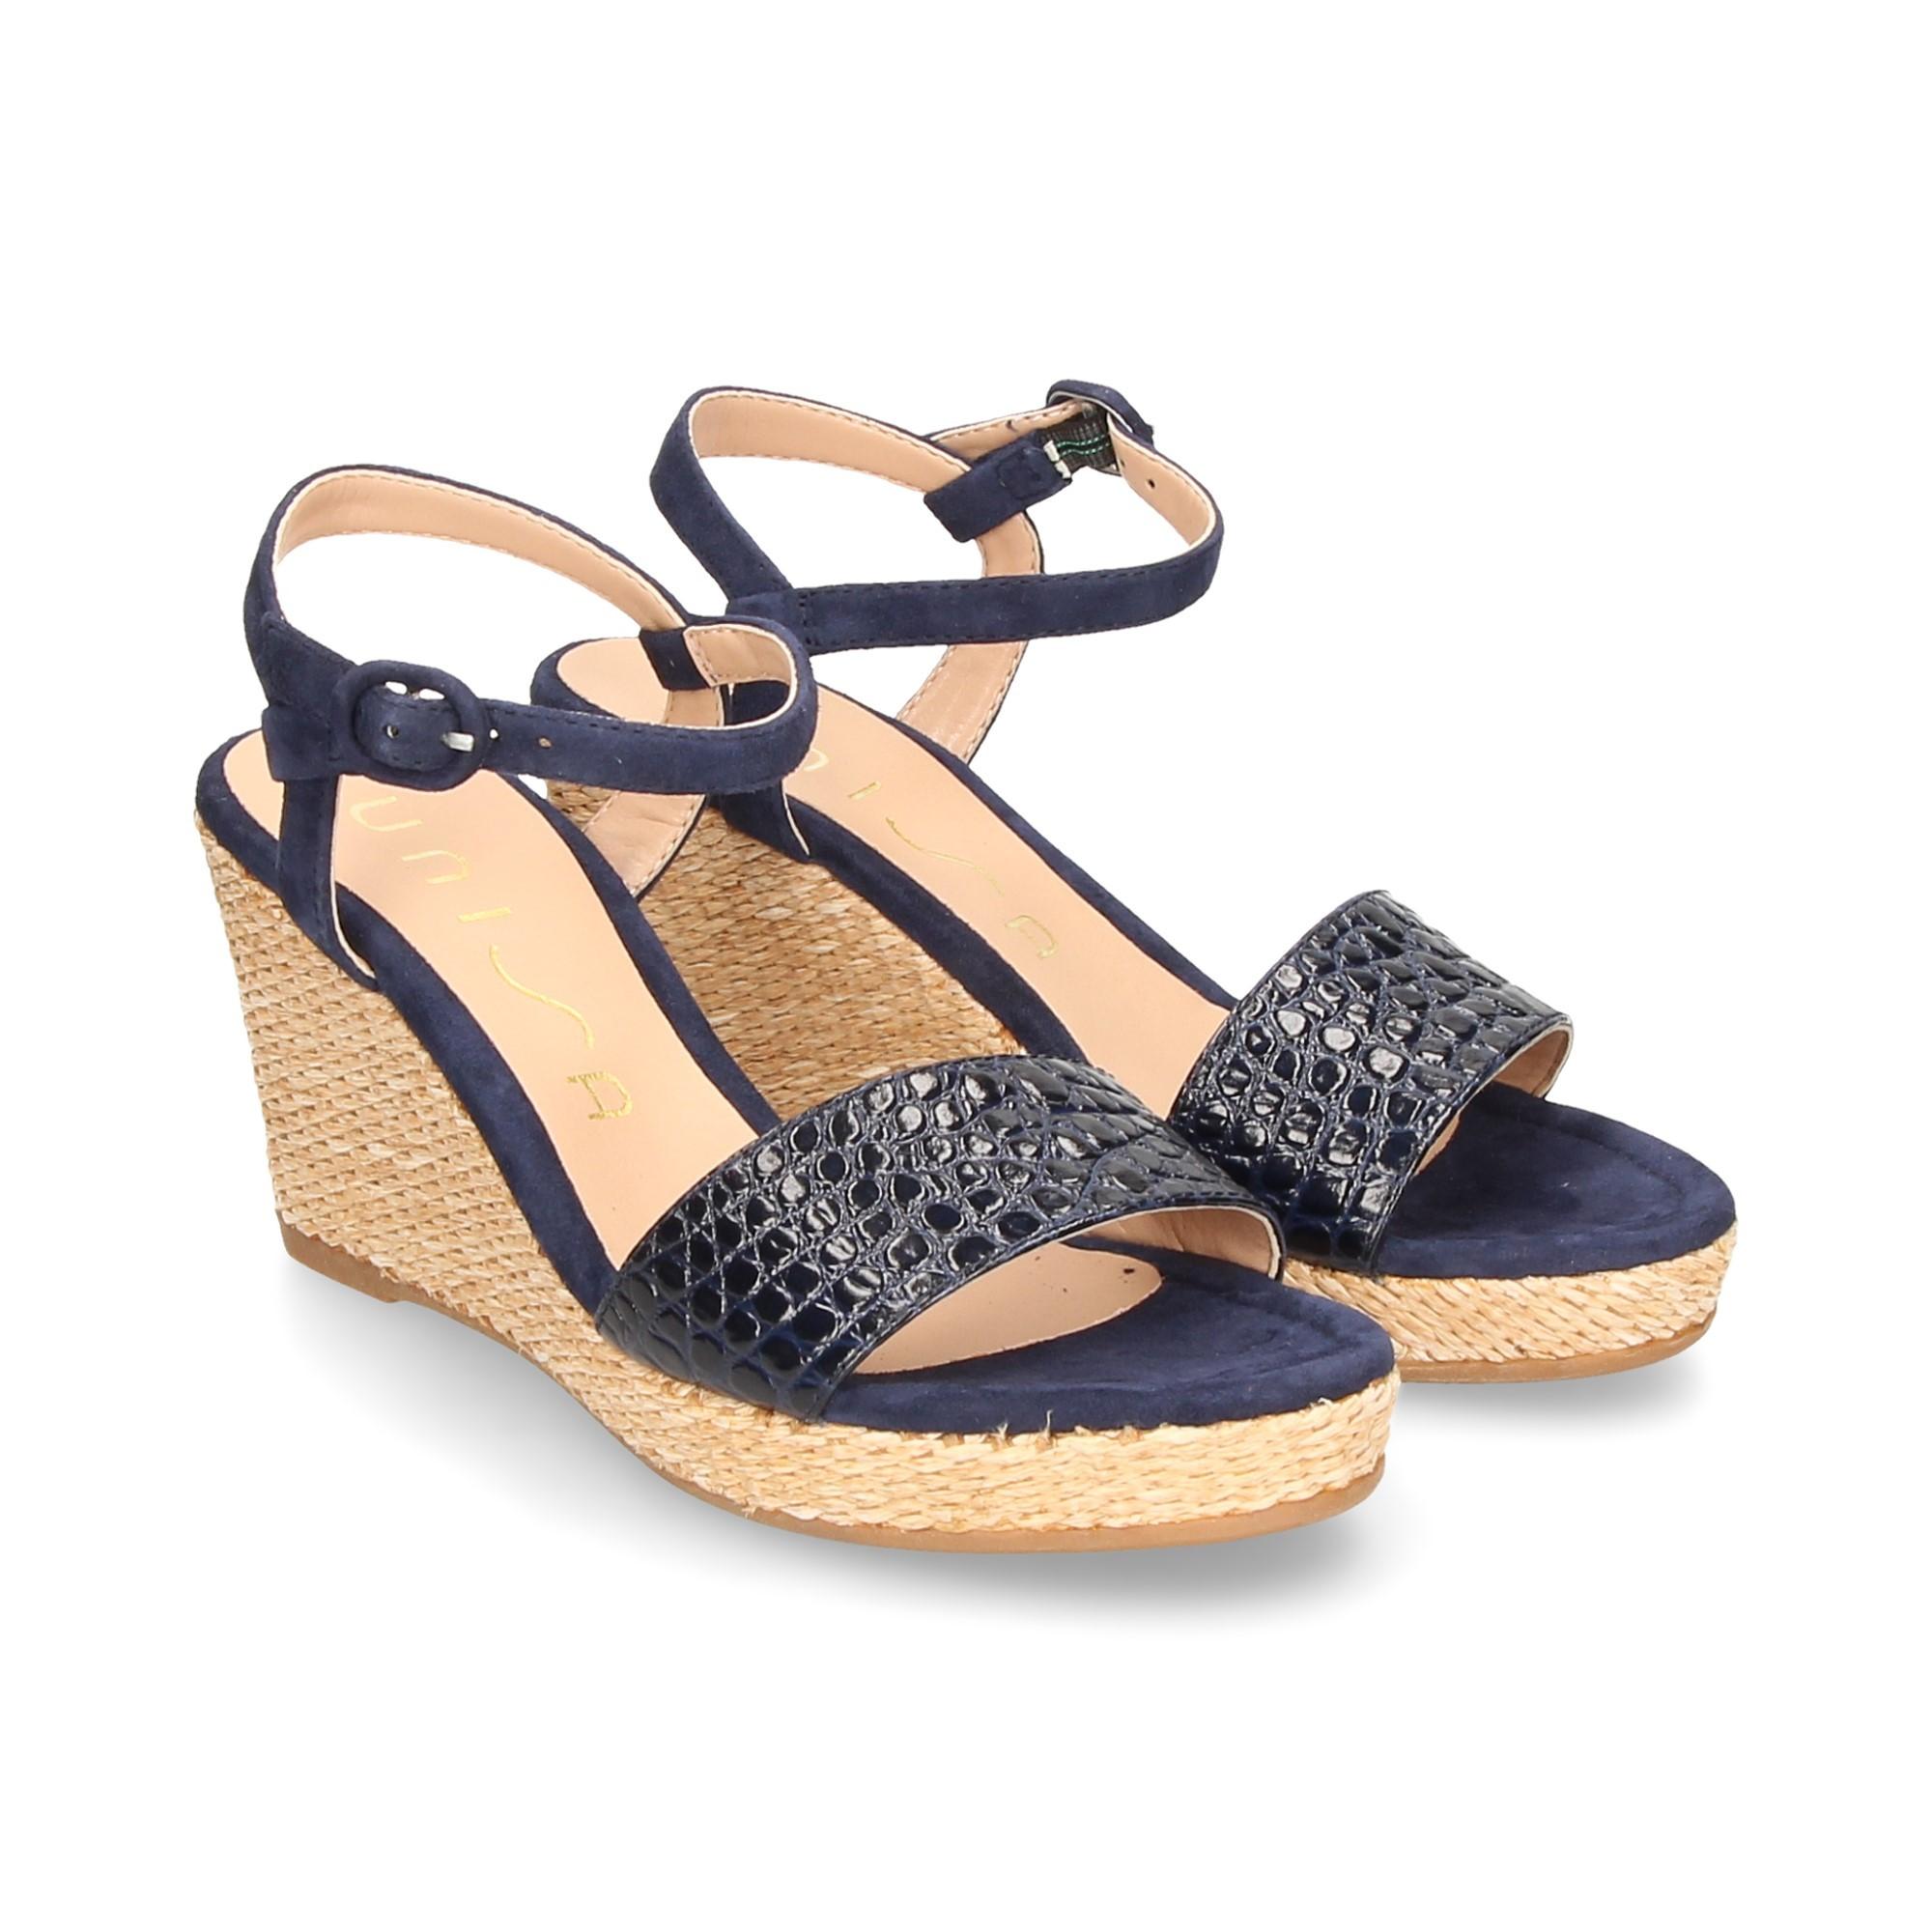 NEW BALANCE Zapatillas de Mujer WXNRGBG AZUL MARINO